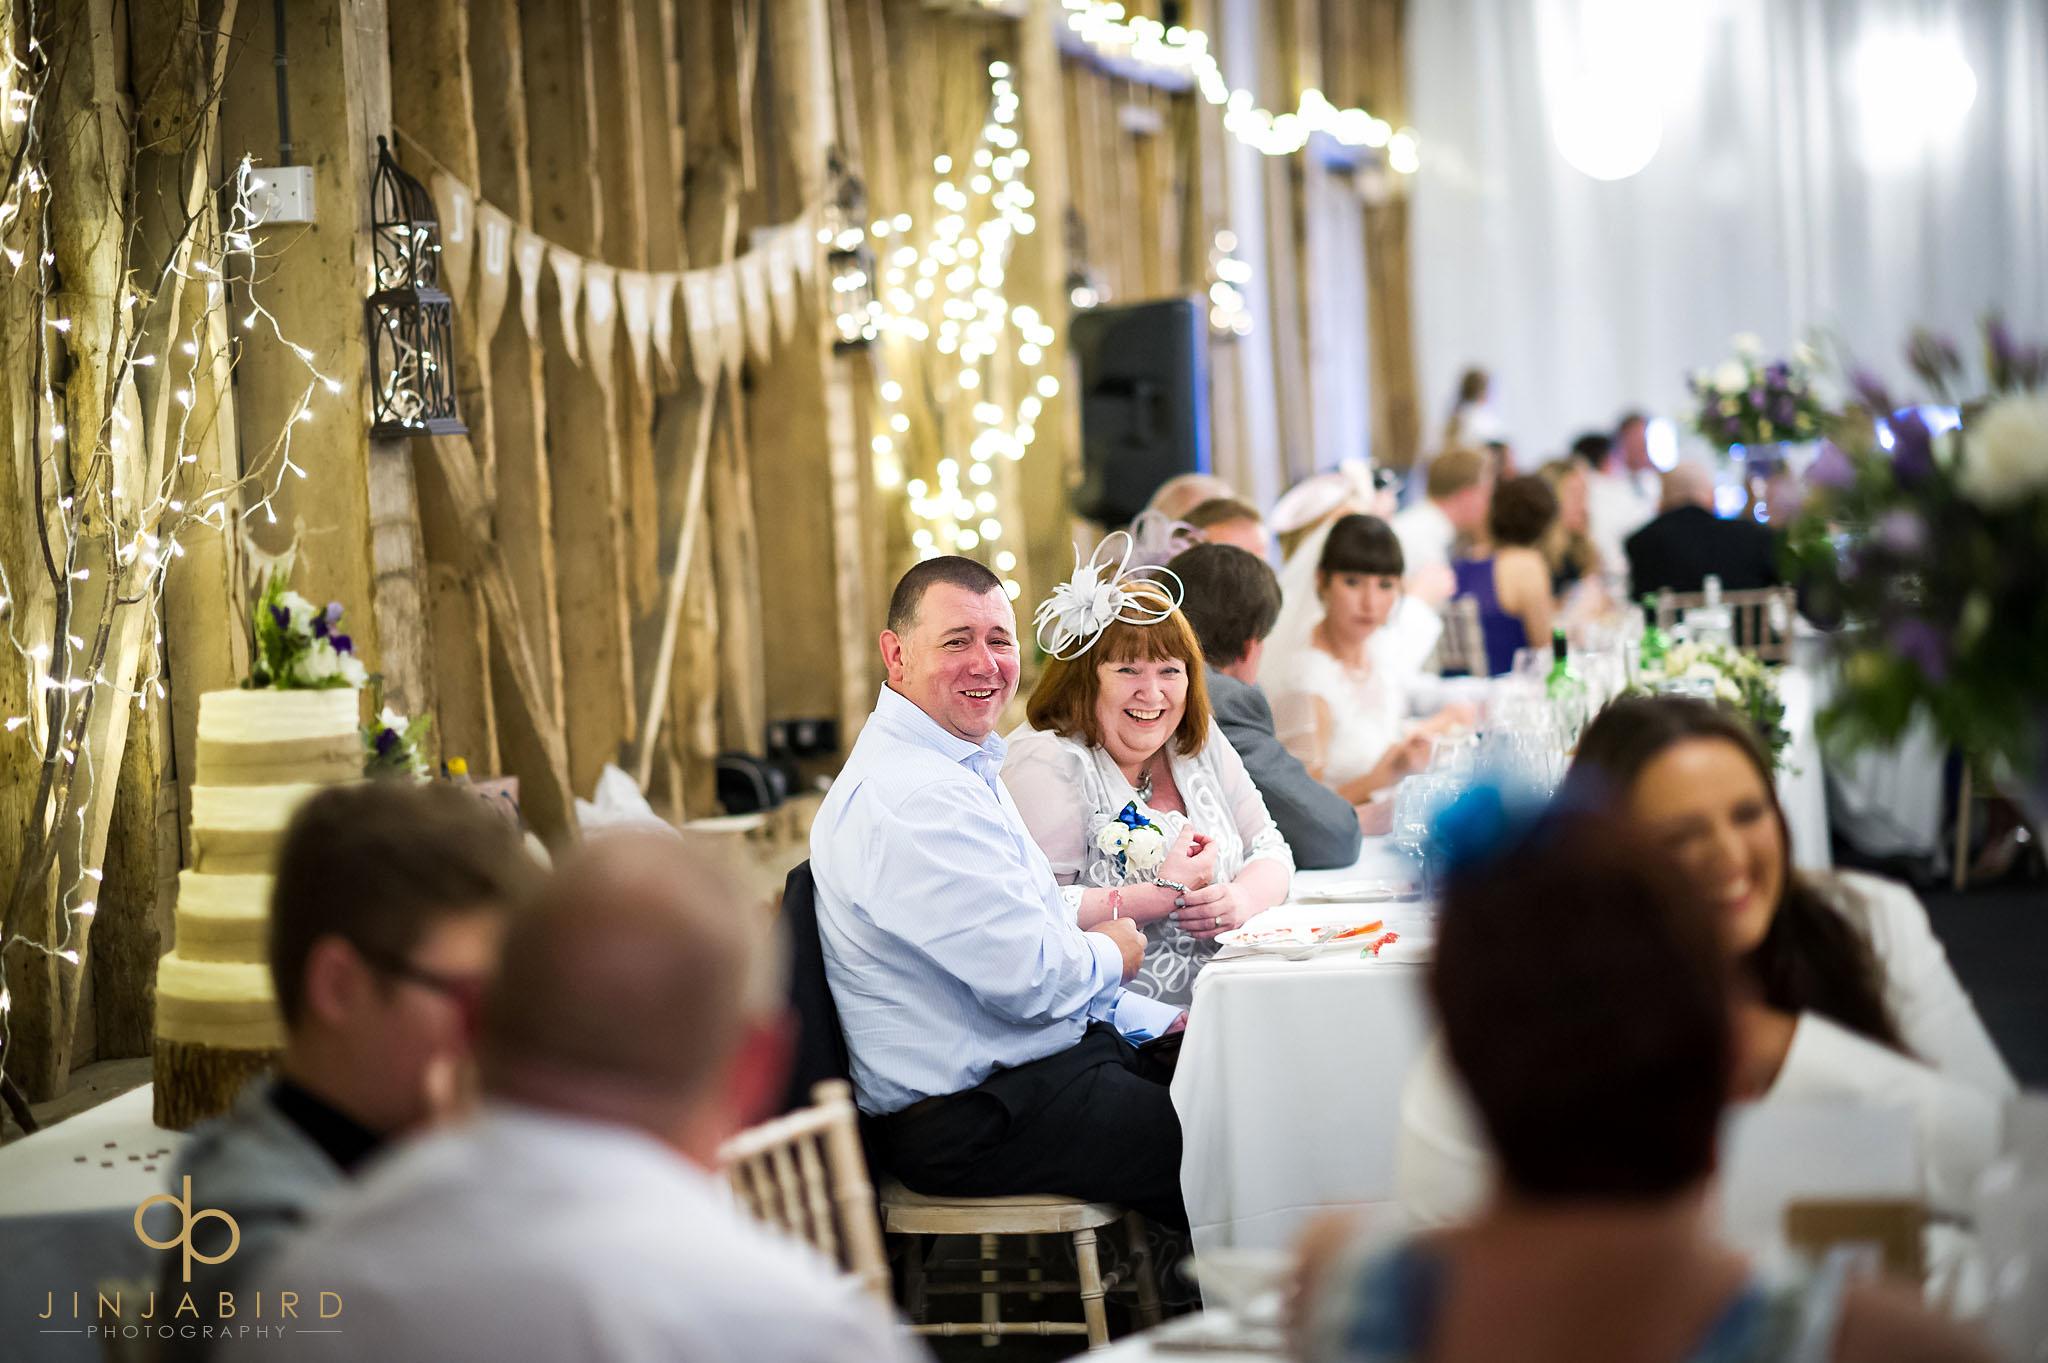 childerley hall wedding photograph